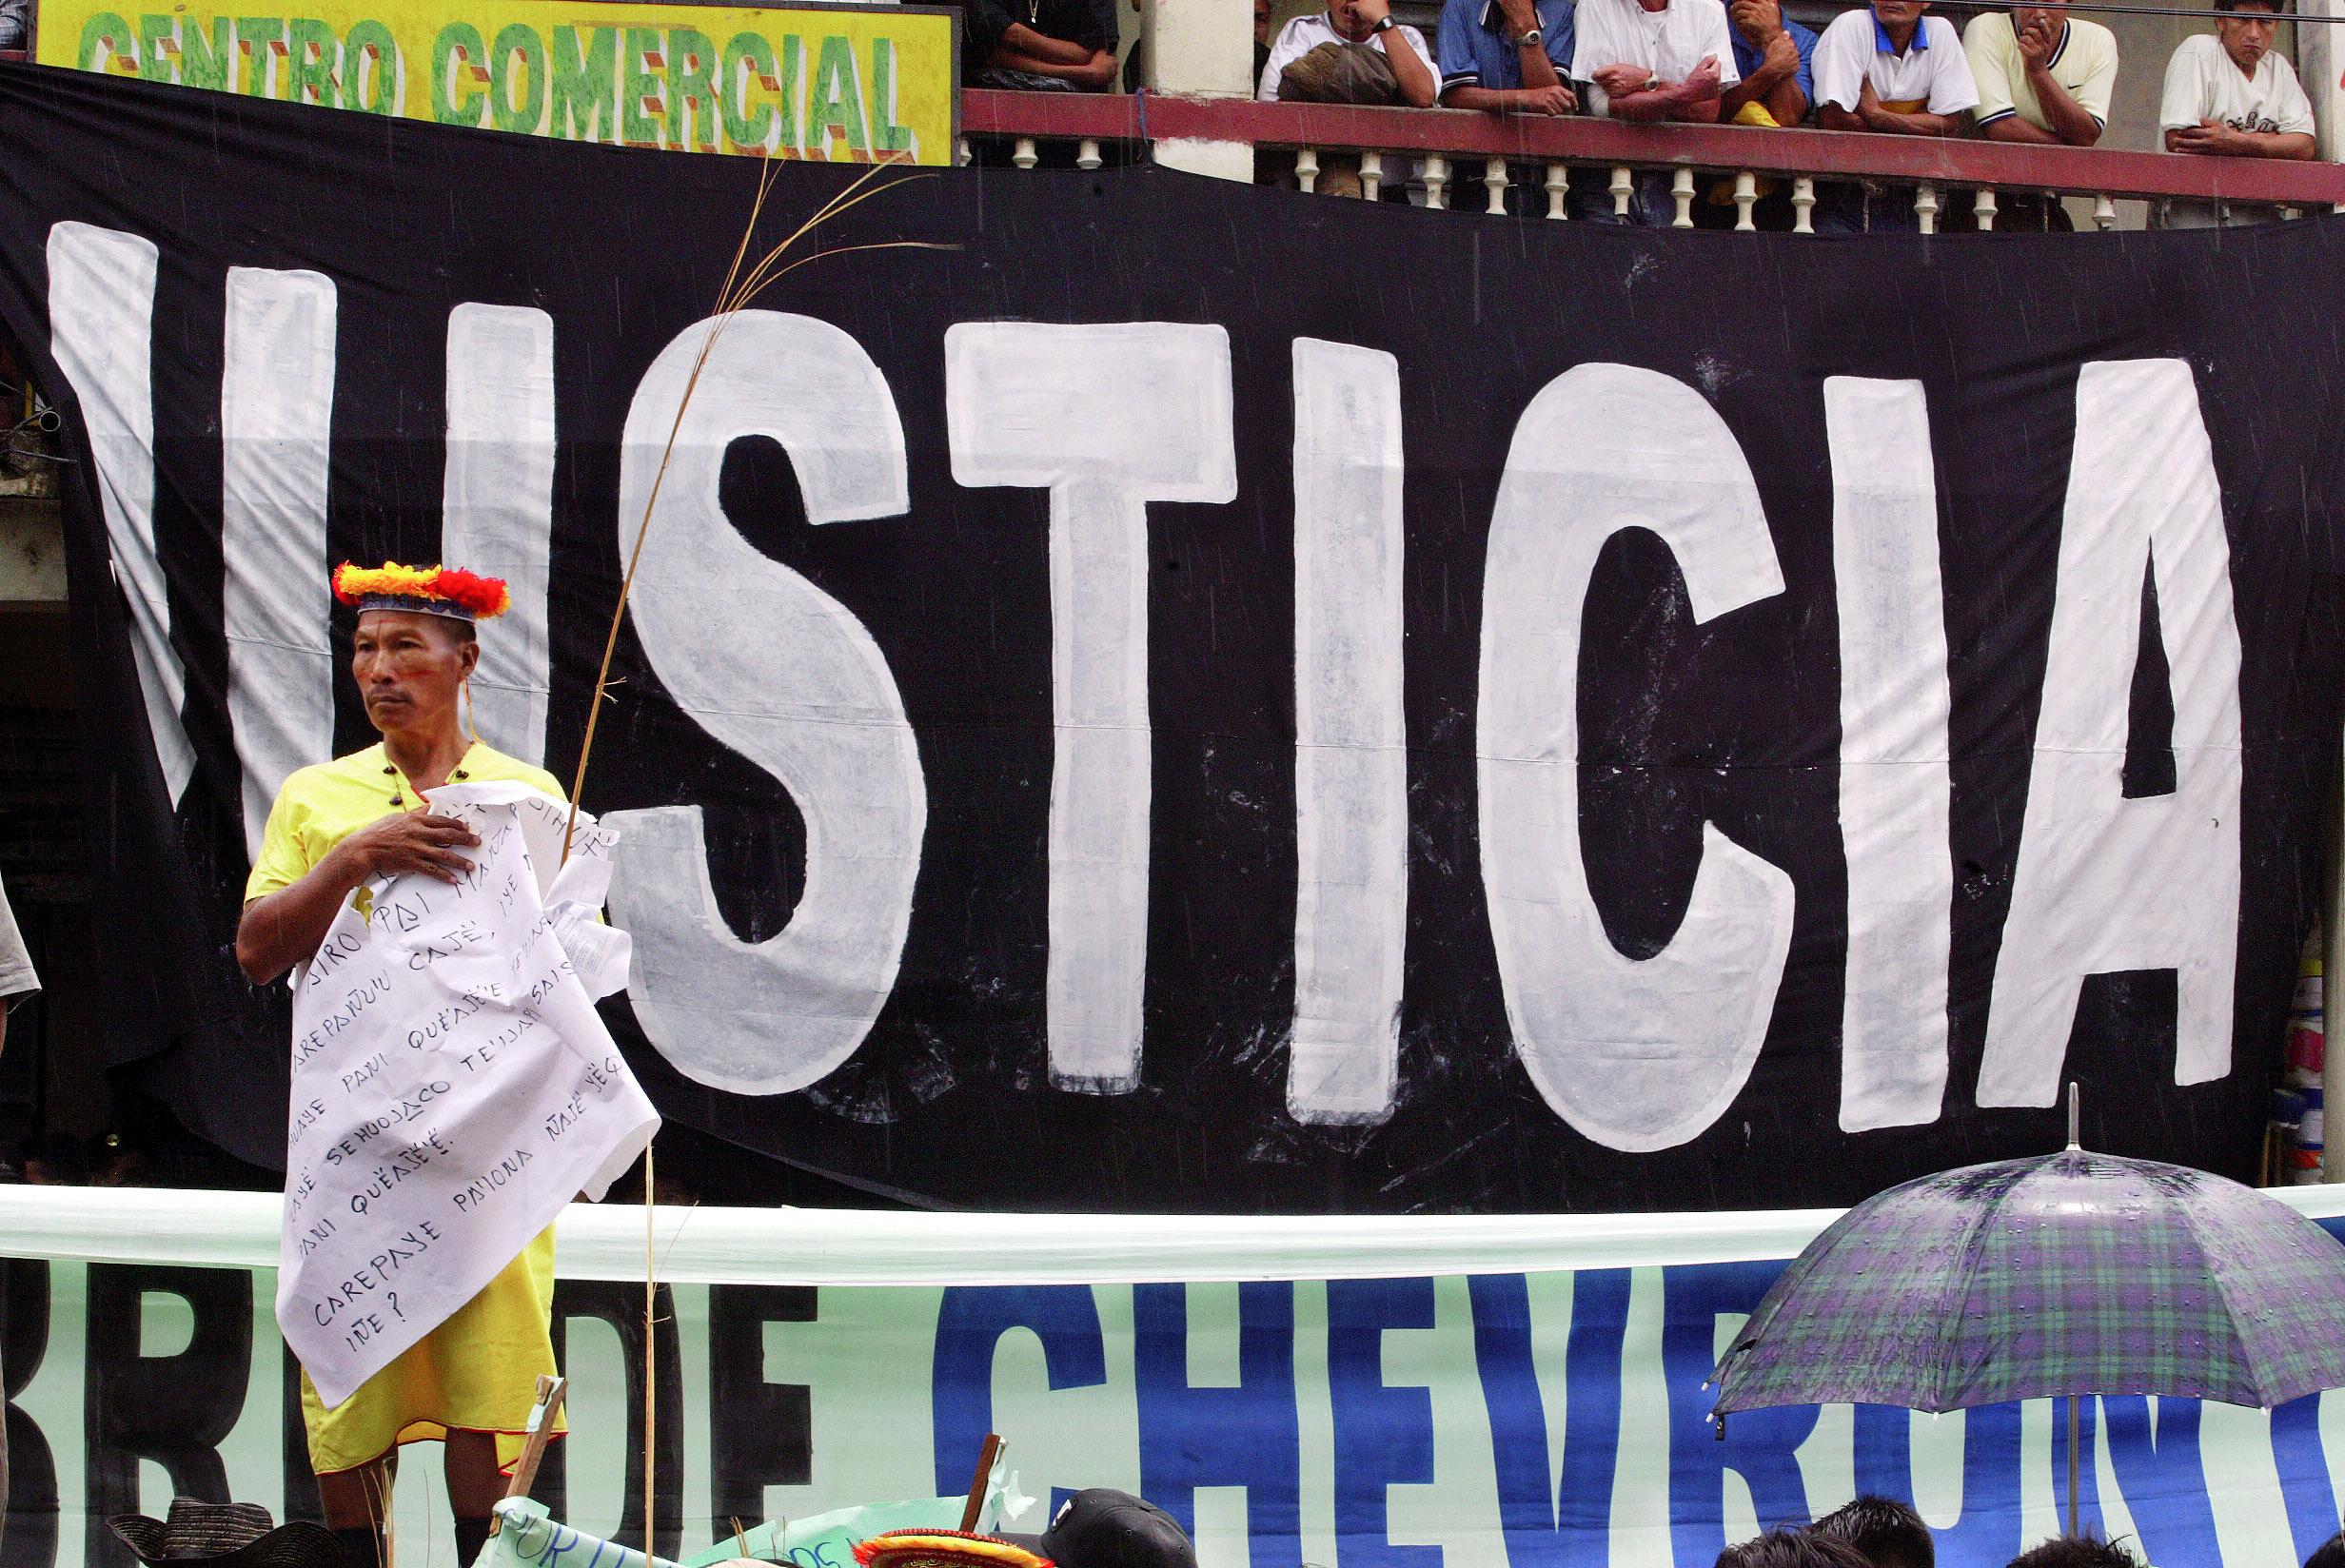 133-JUSTICIA